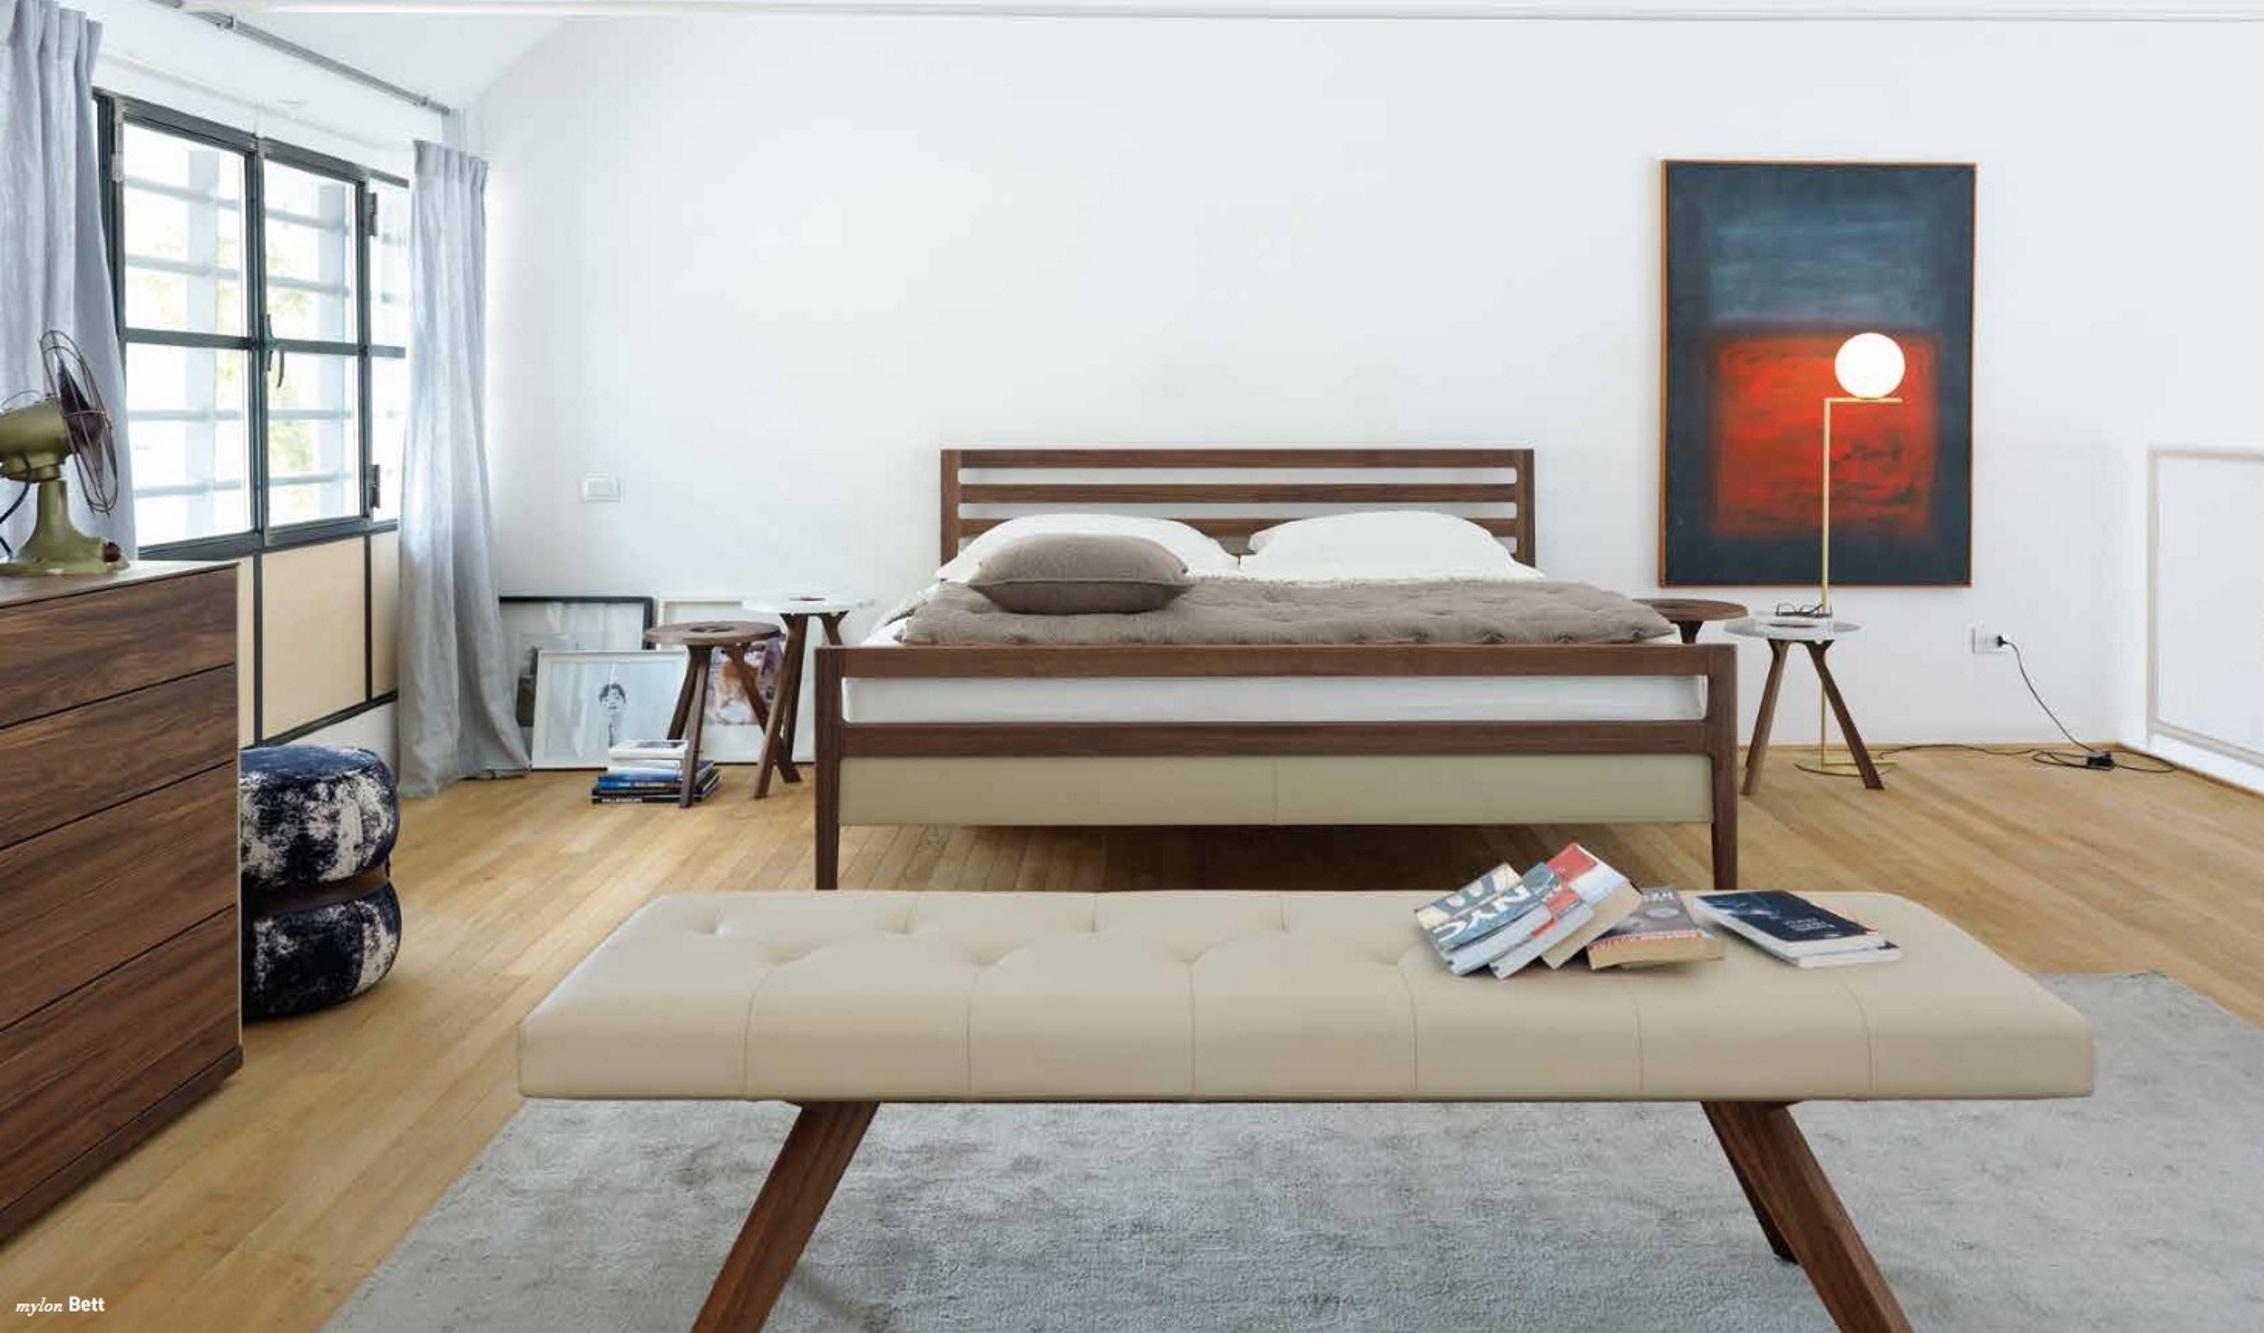 bank aus bett sitzbank bett fresh to go bettbank mit. Black Bedroom Furniture Sets. Home Design Ideas